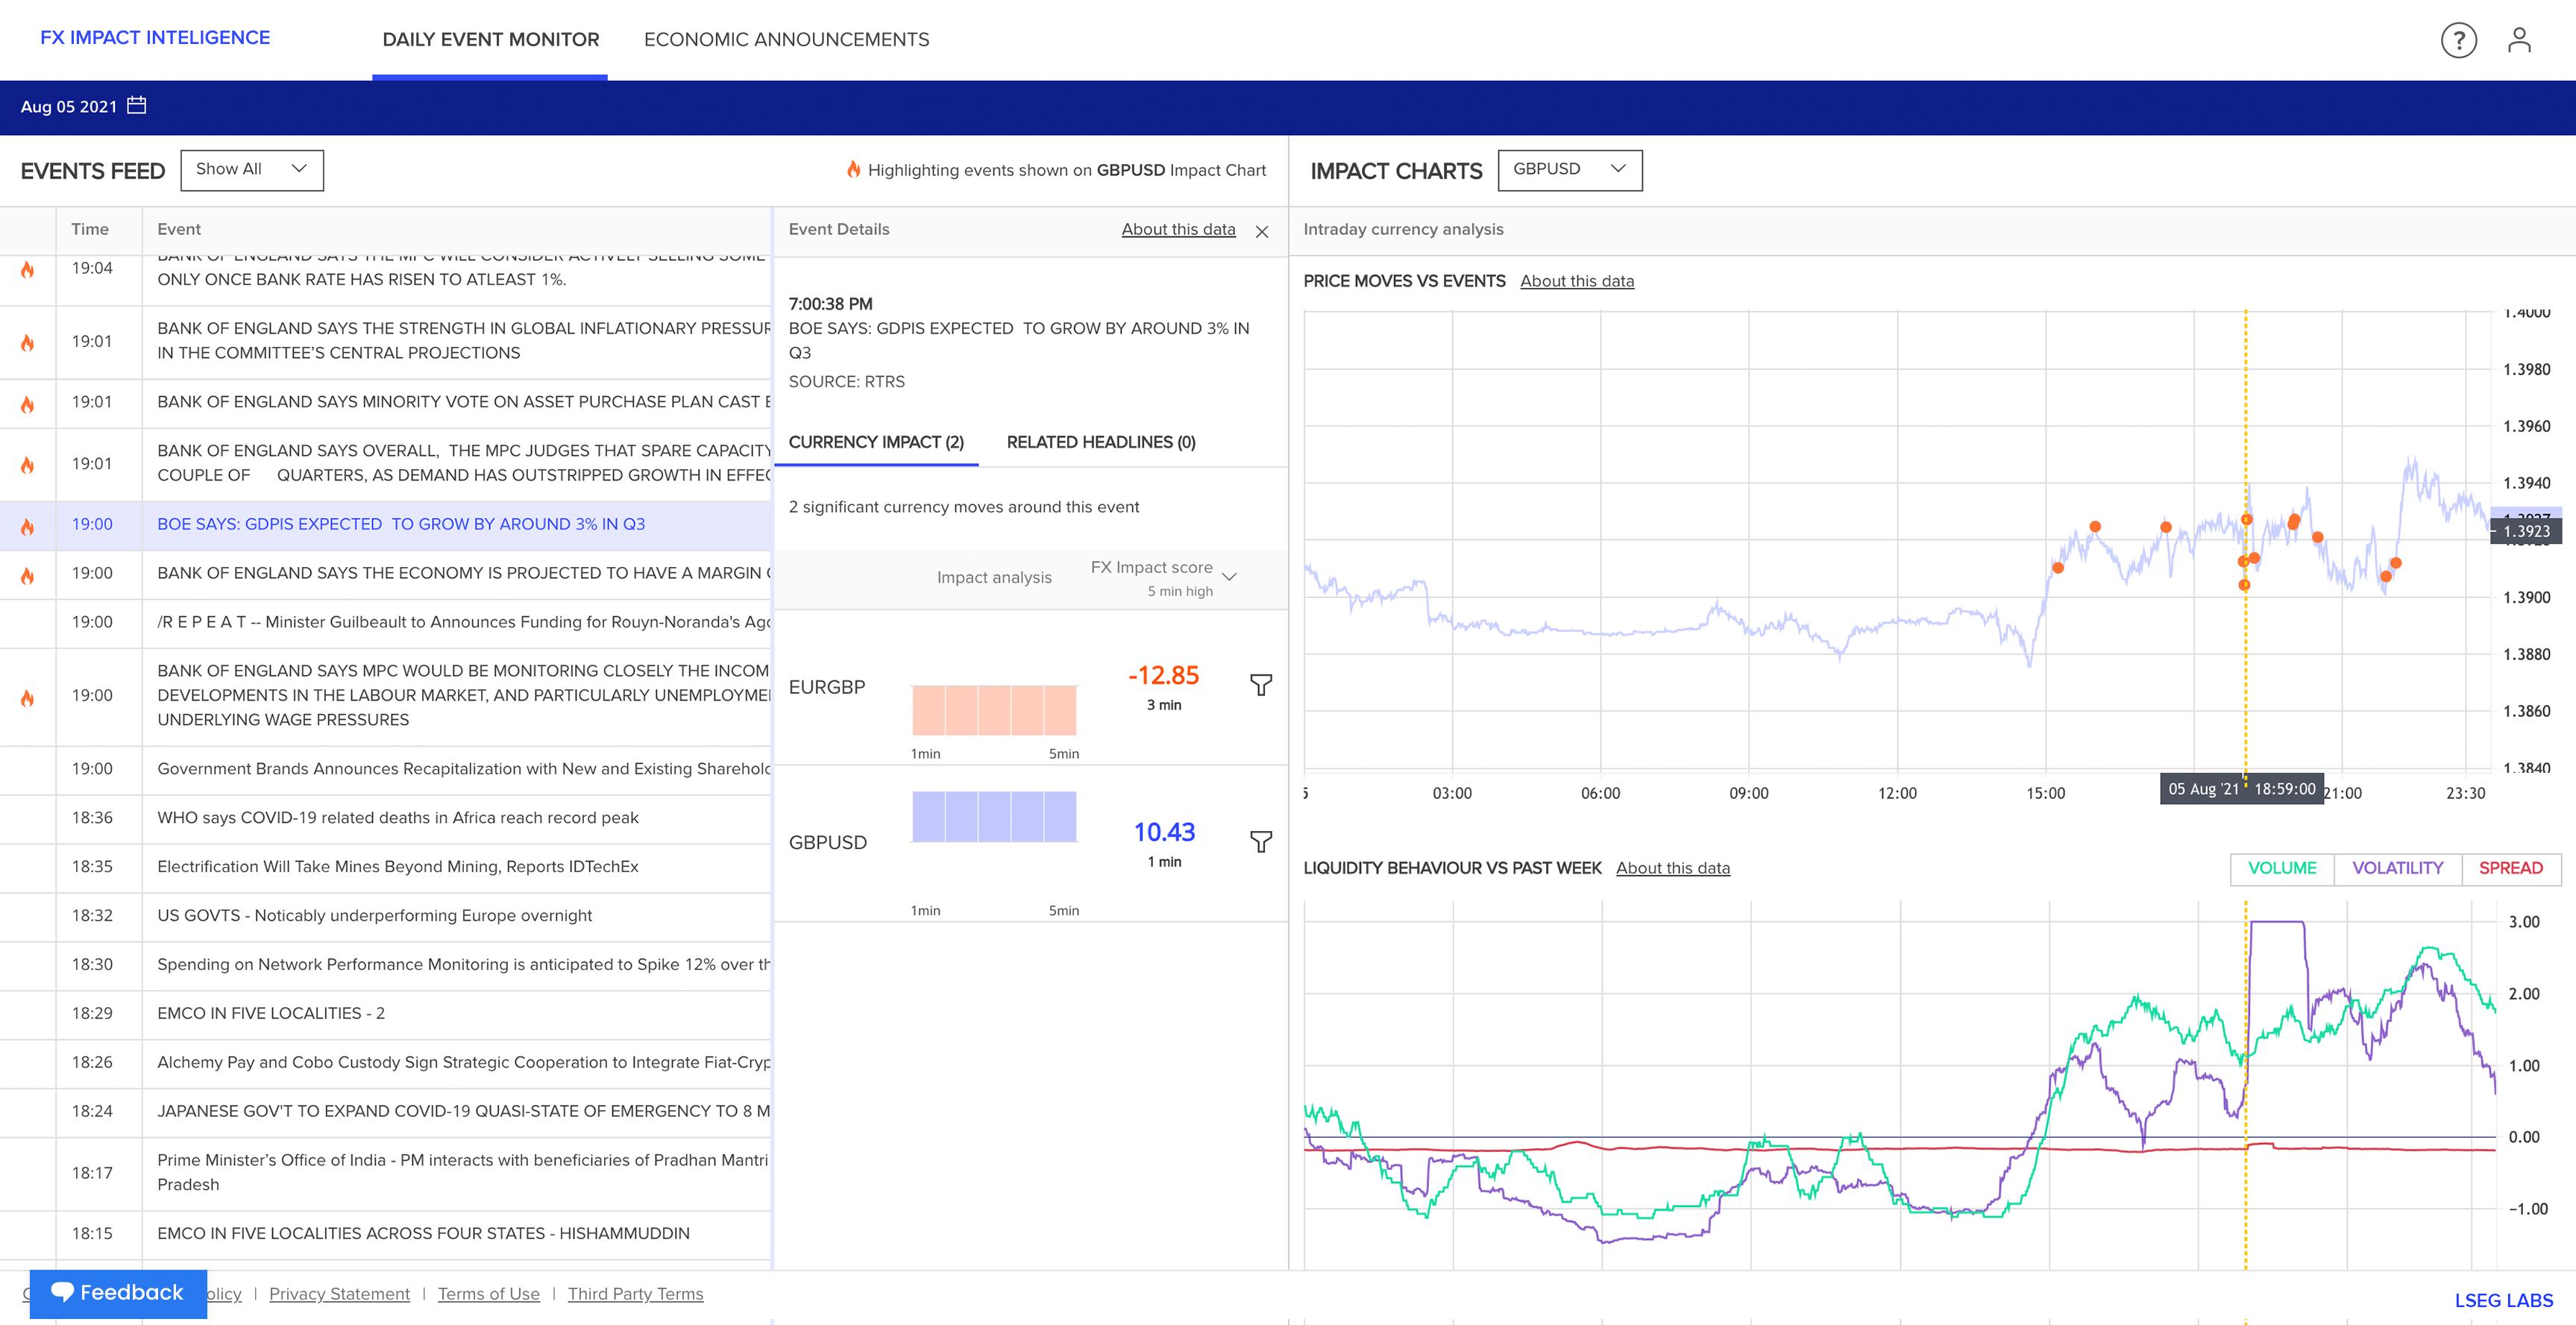 LSEG Labs: FX Impact Intelligence